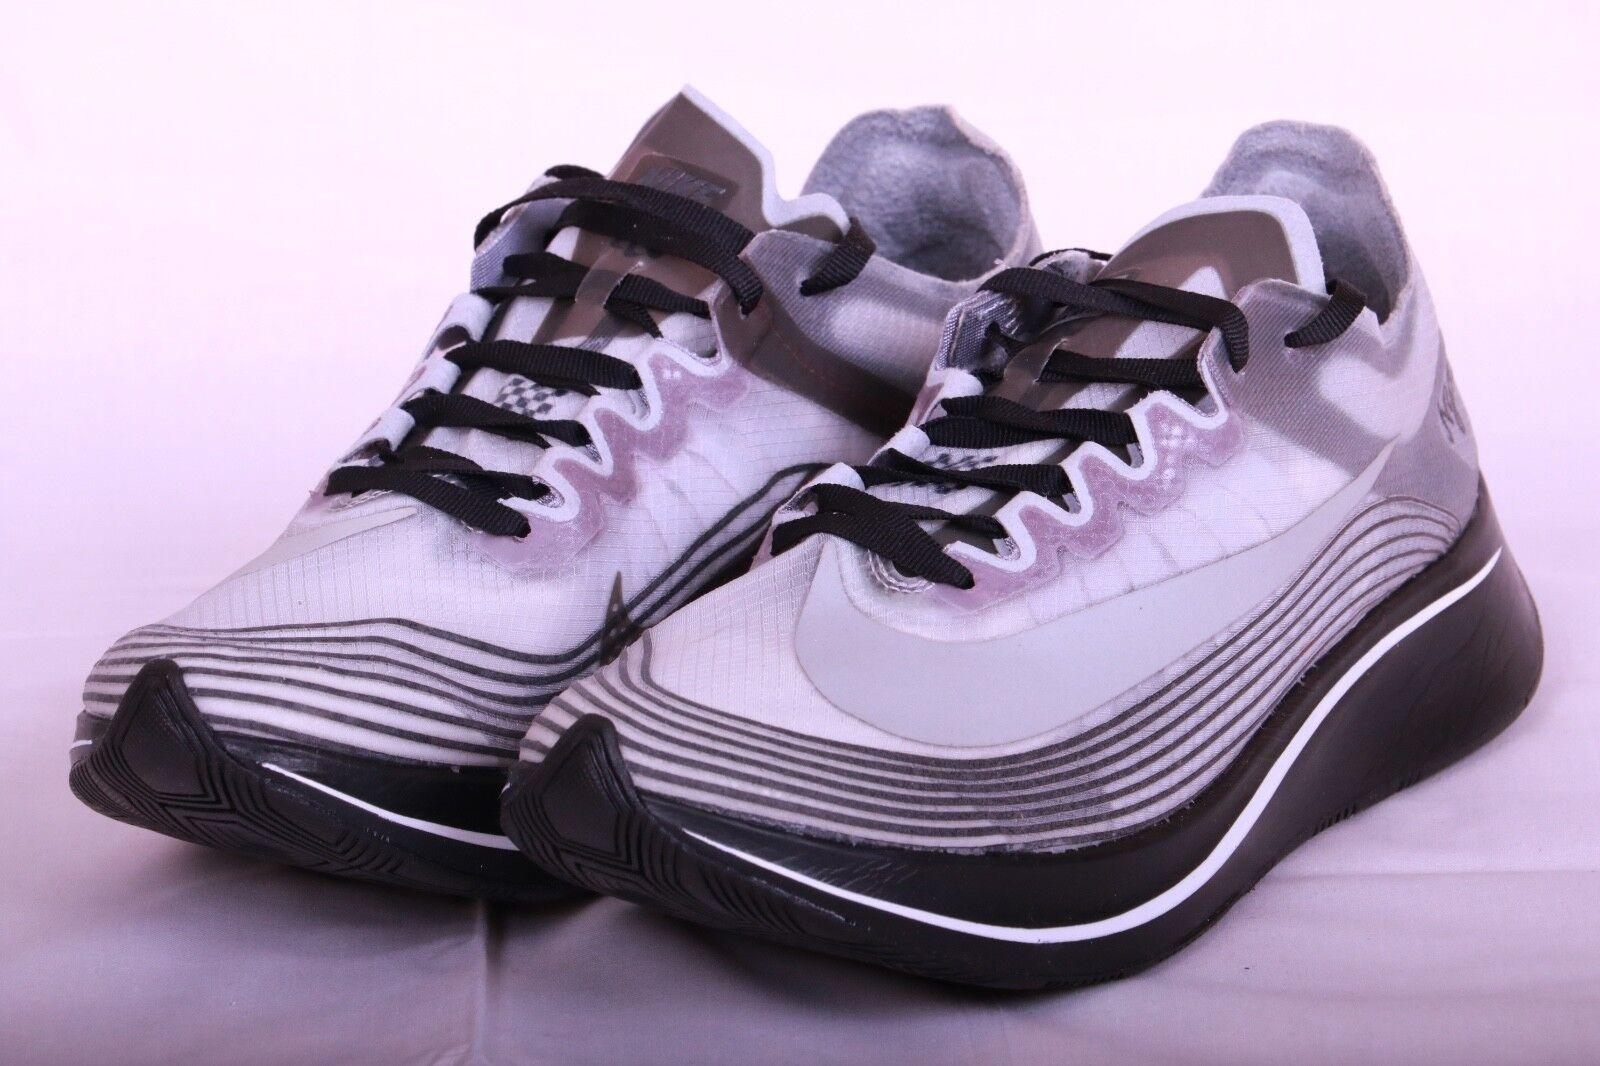 adf441c3bd018 Mens NikeLab Zoom Fly SP NYC Metallic Silver White Black Ah5088-001 ...